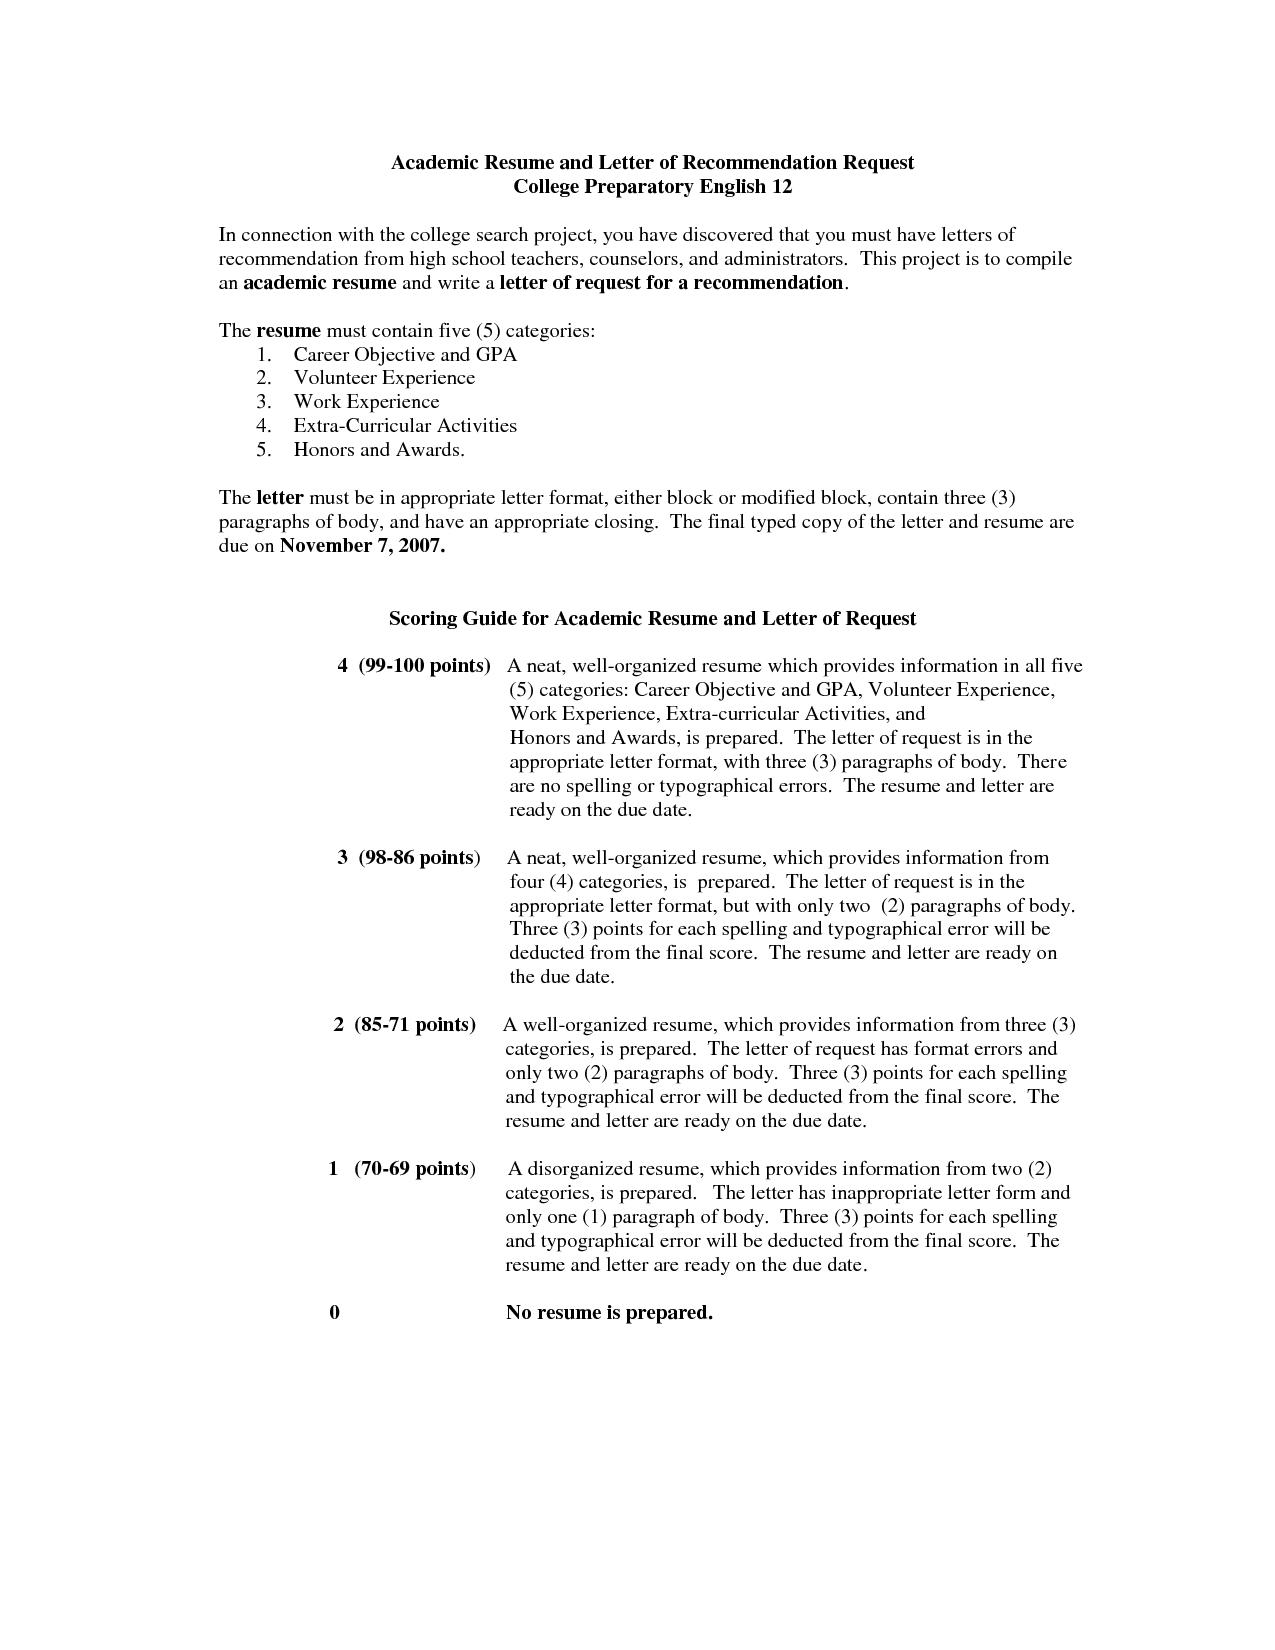 Resume Format Recommendations Resume Format Pinterest Resume